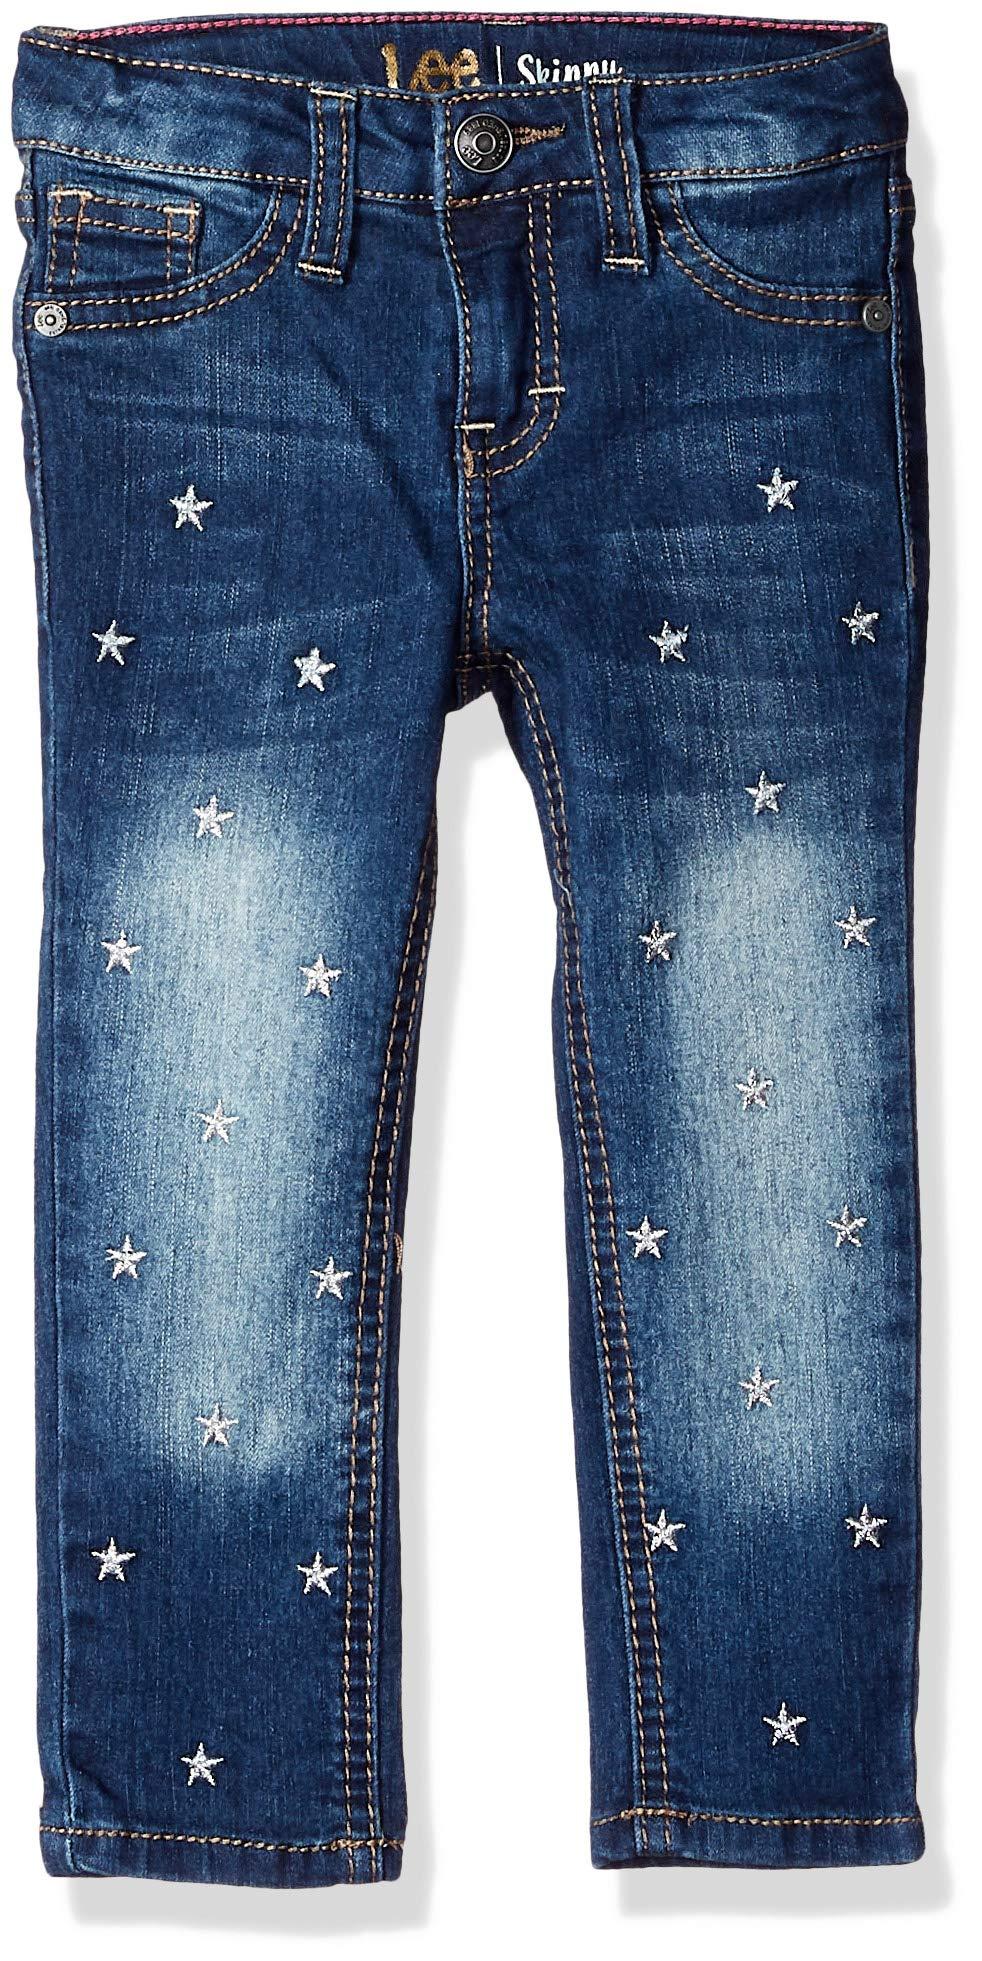 LEE Girls' Toddler Fashion Skinny Jean, Star Deep Blue, 3T